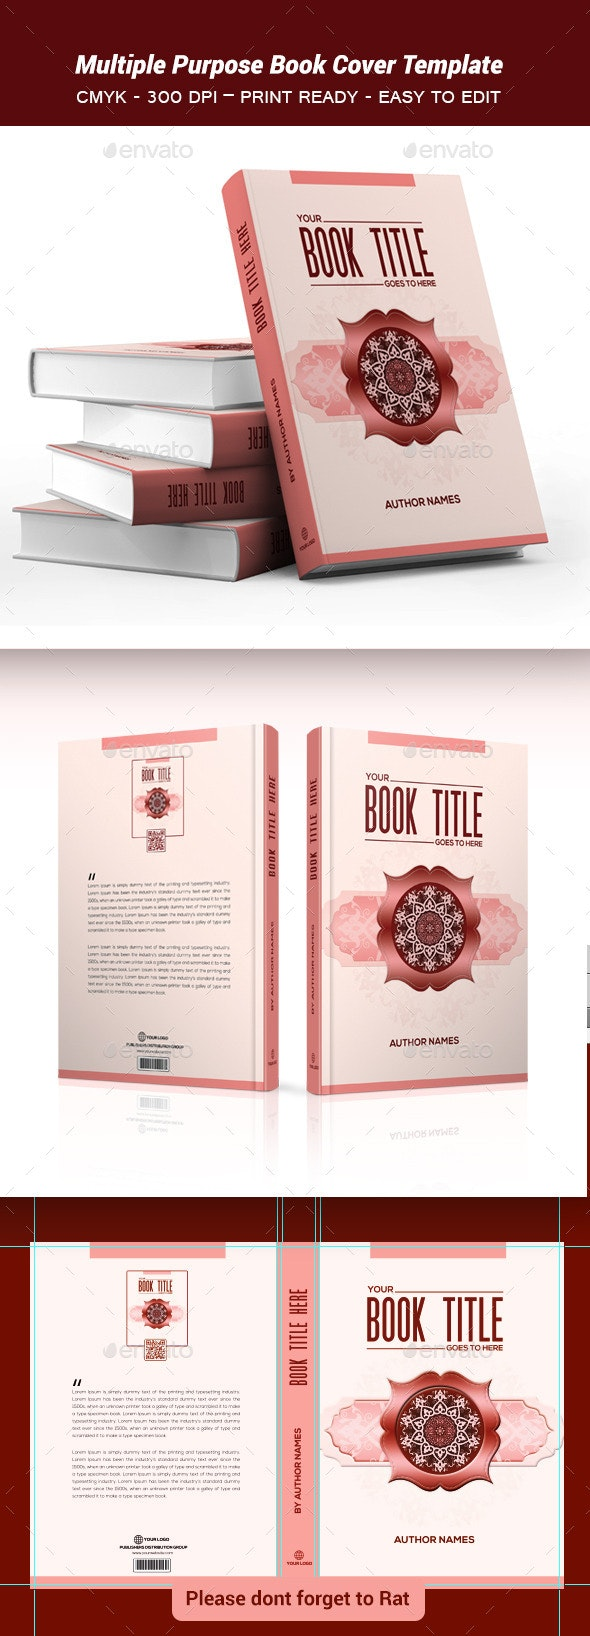 Multiple Purpose Book Cover Template2 - Print Templates